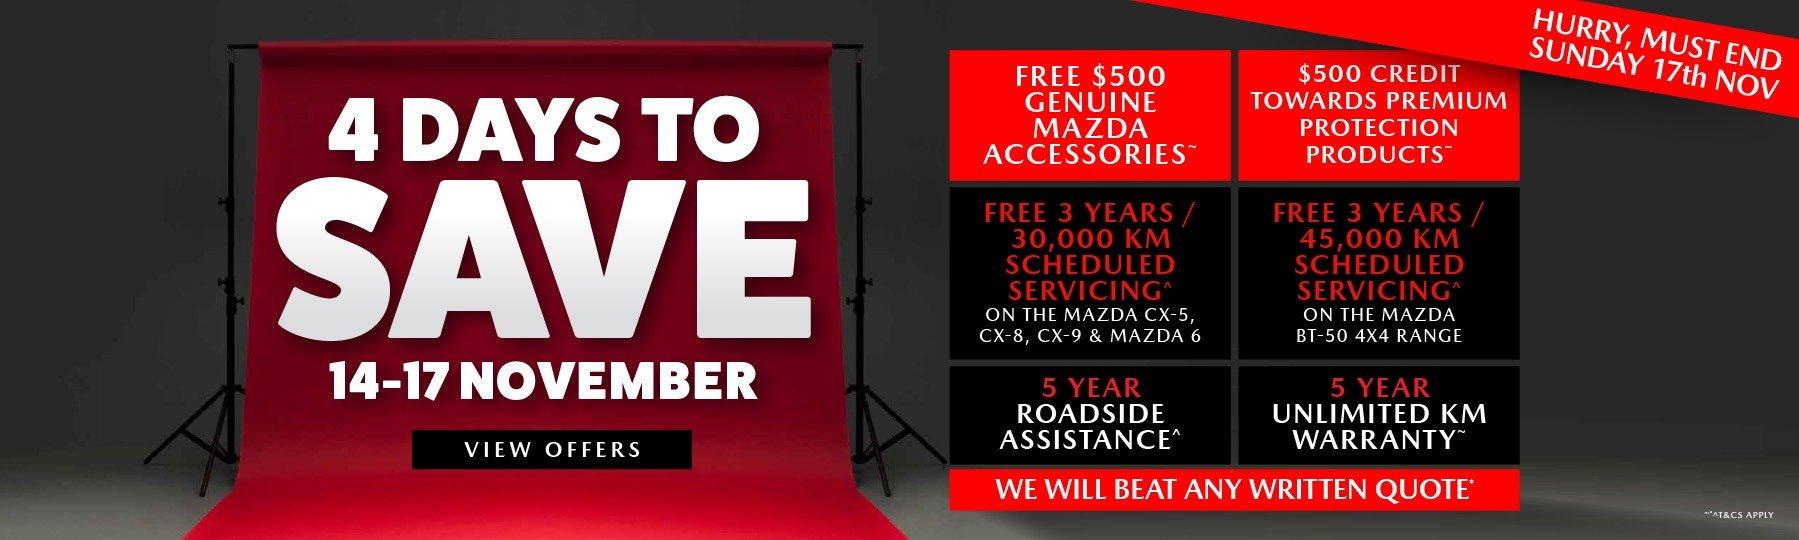 Macarthur Mazda - 4 Day Sale